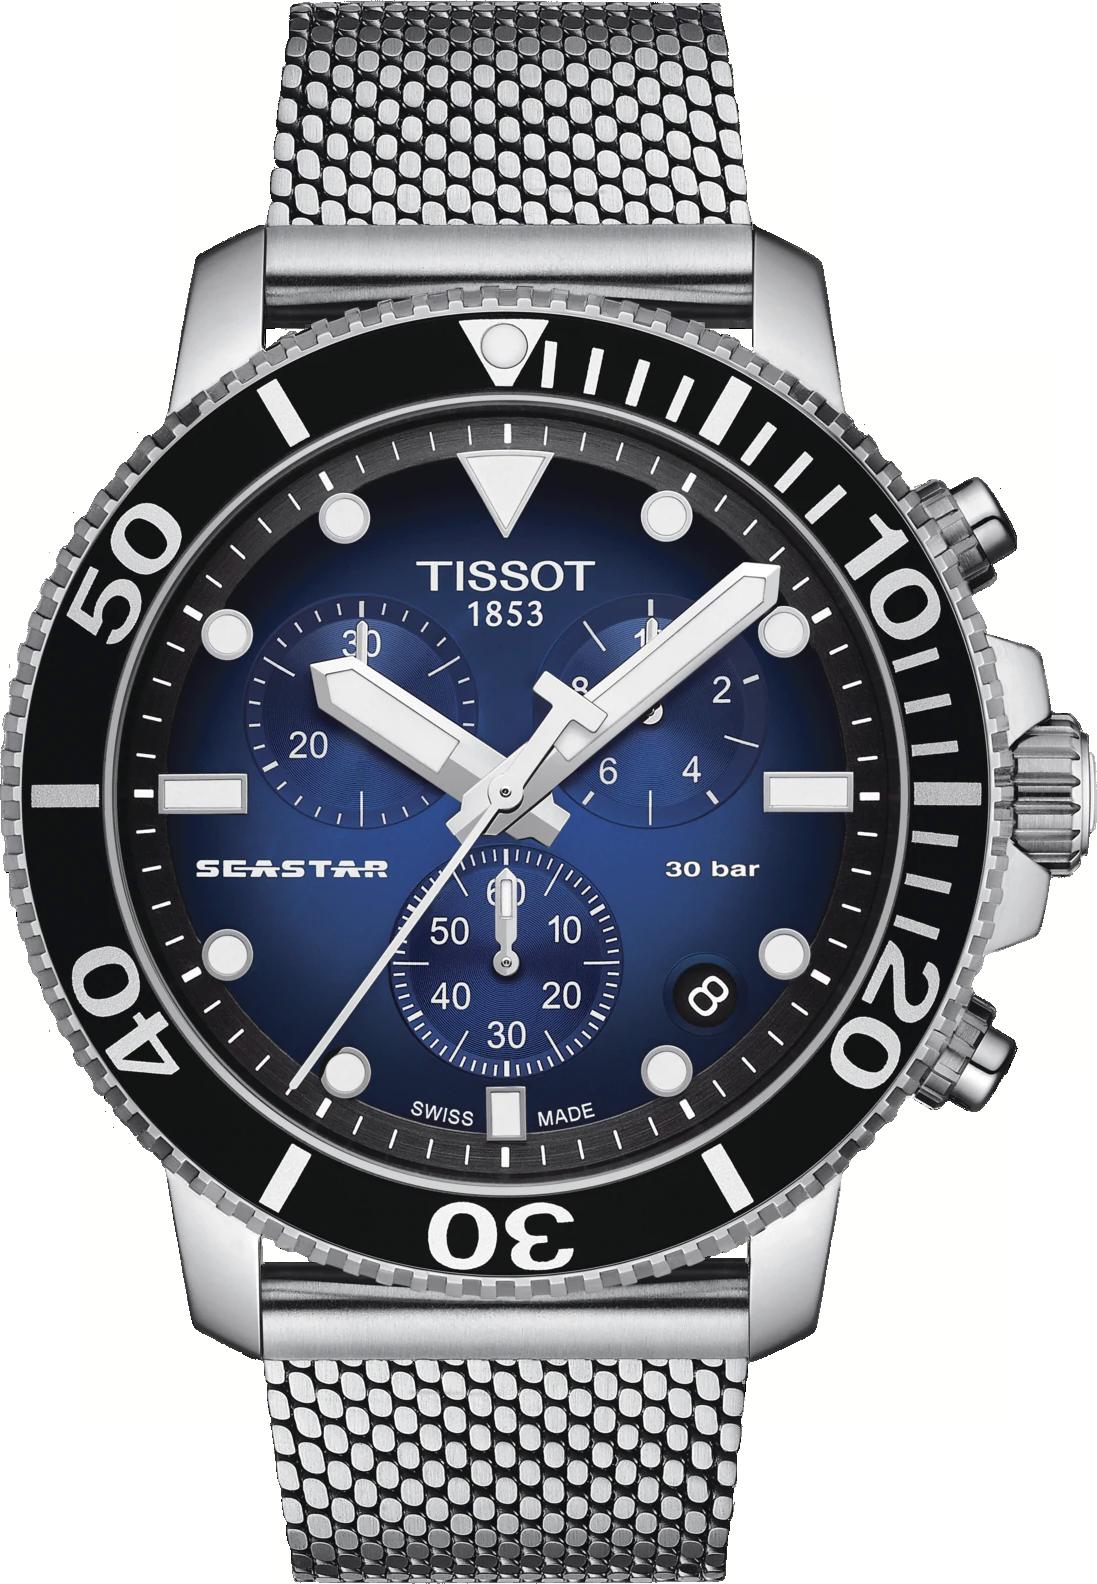 Tissot T120.417.11.041.02